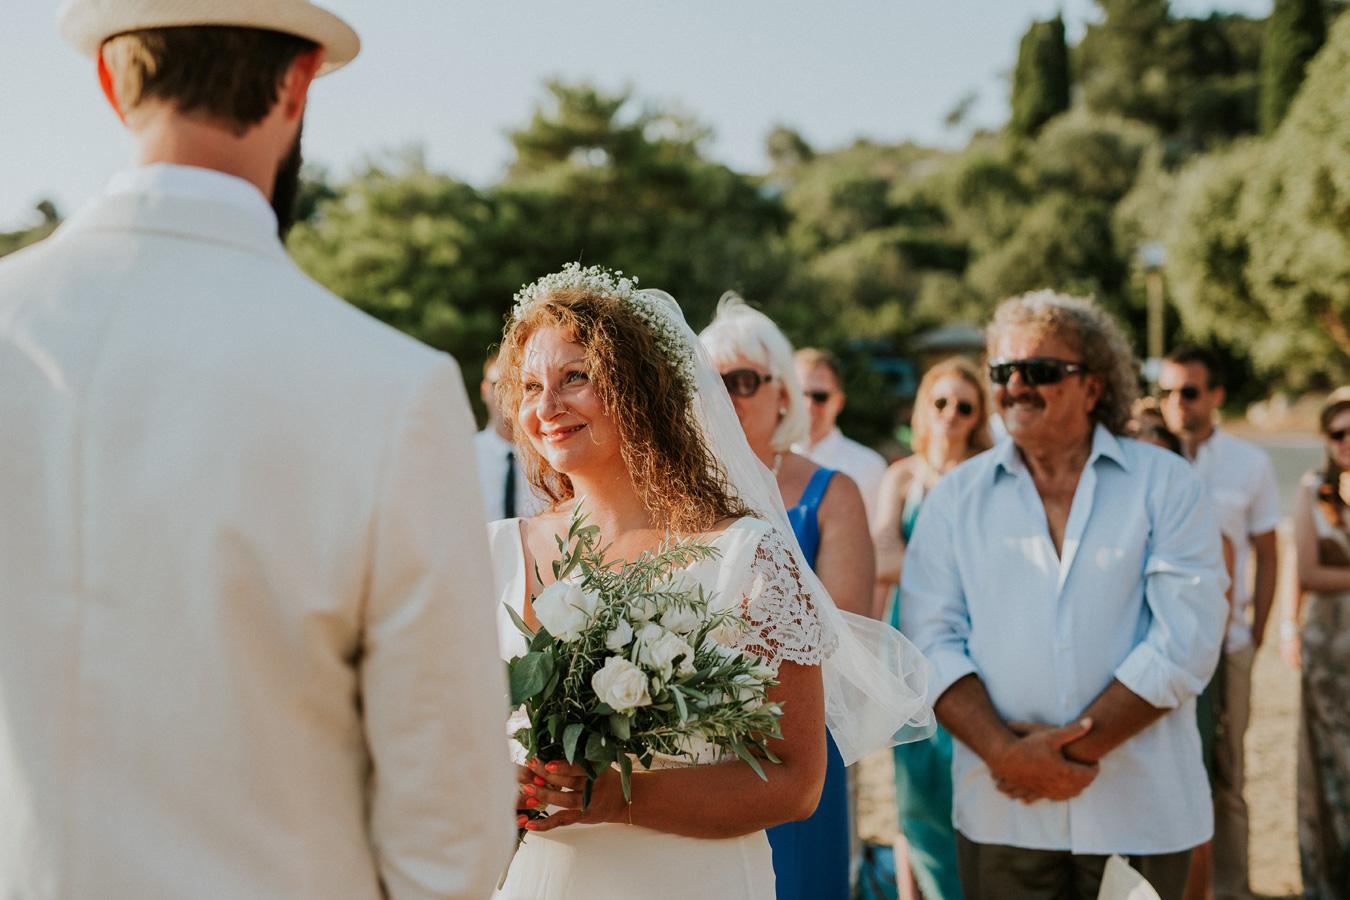 061-bryllupsfotograf-oslo-destinasjonsbryllup-fotograf-tone-tvedt.jpg